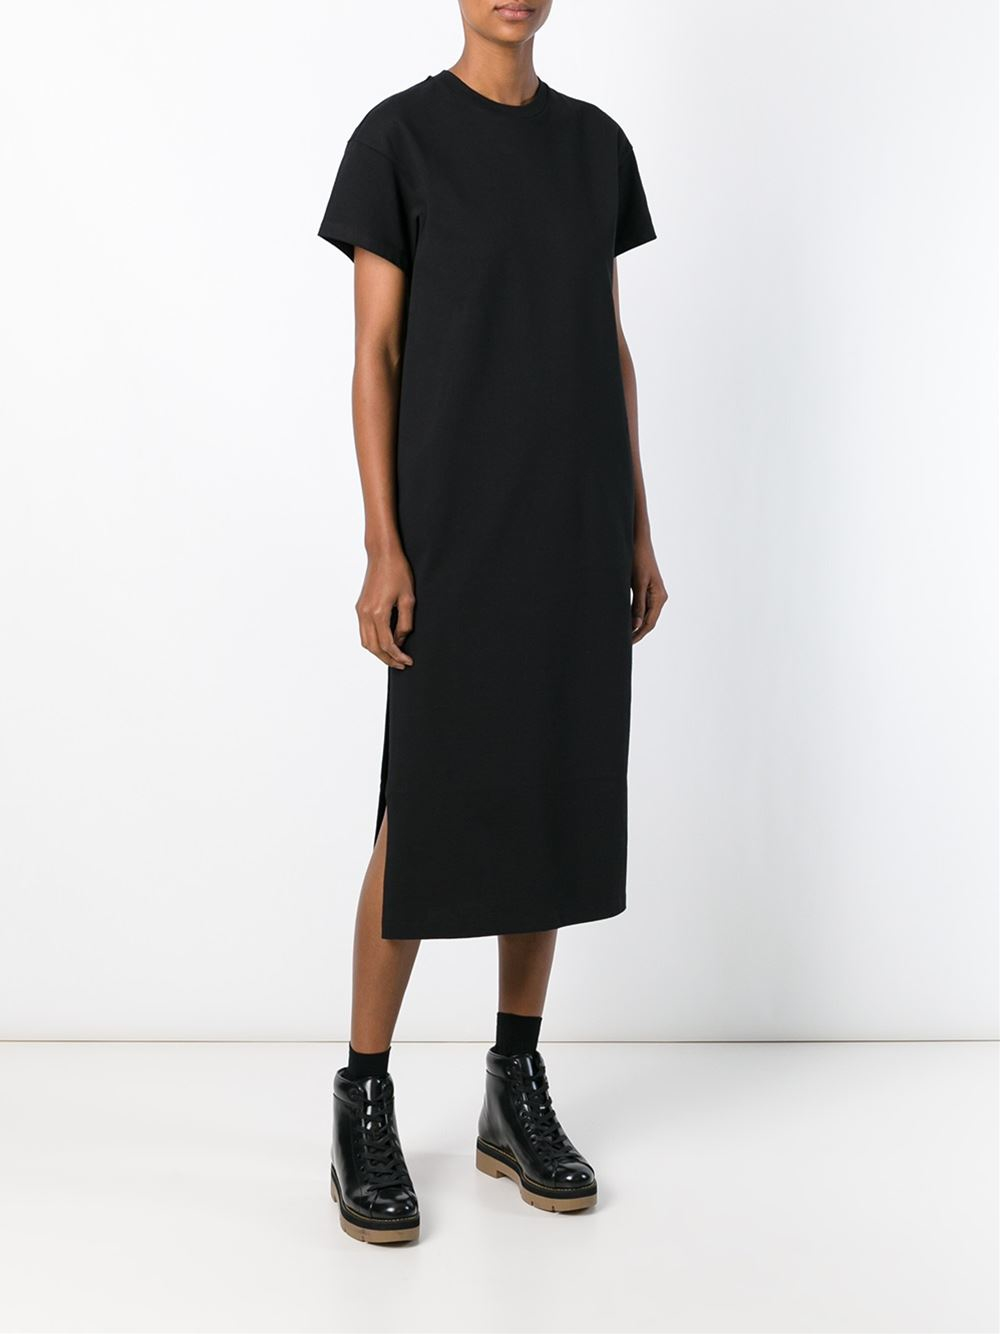 Lyst t by alexander wang midi t shirt dress in black for Midi shirt dress black